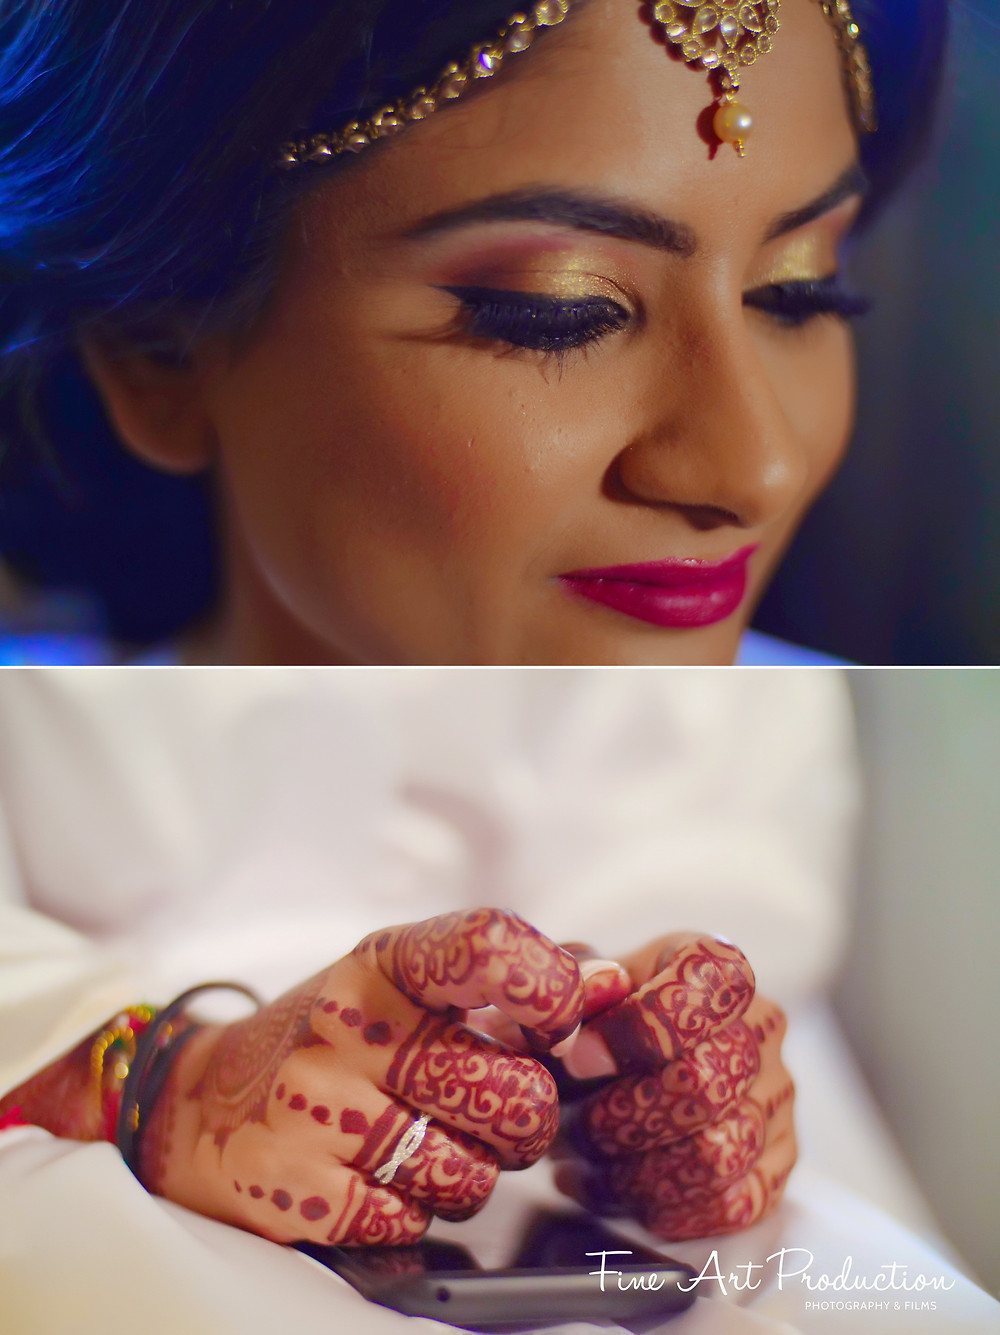 henna-mehndi-bridal-beauty-wedding-band-ring-indian-bride-photography